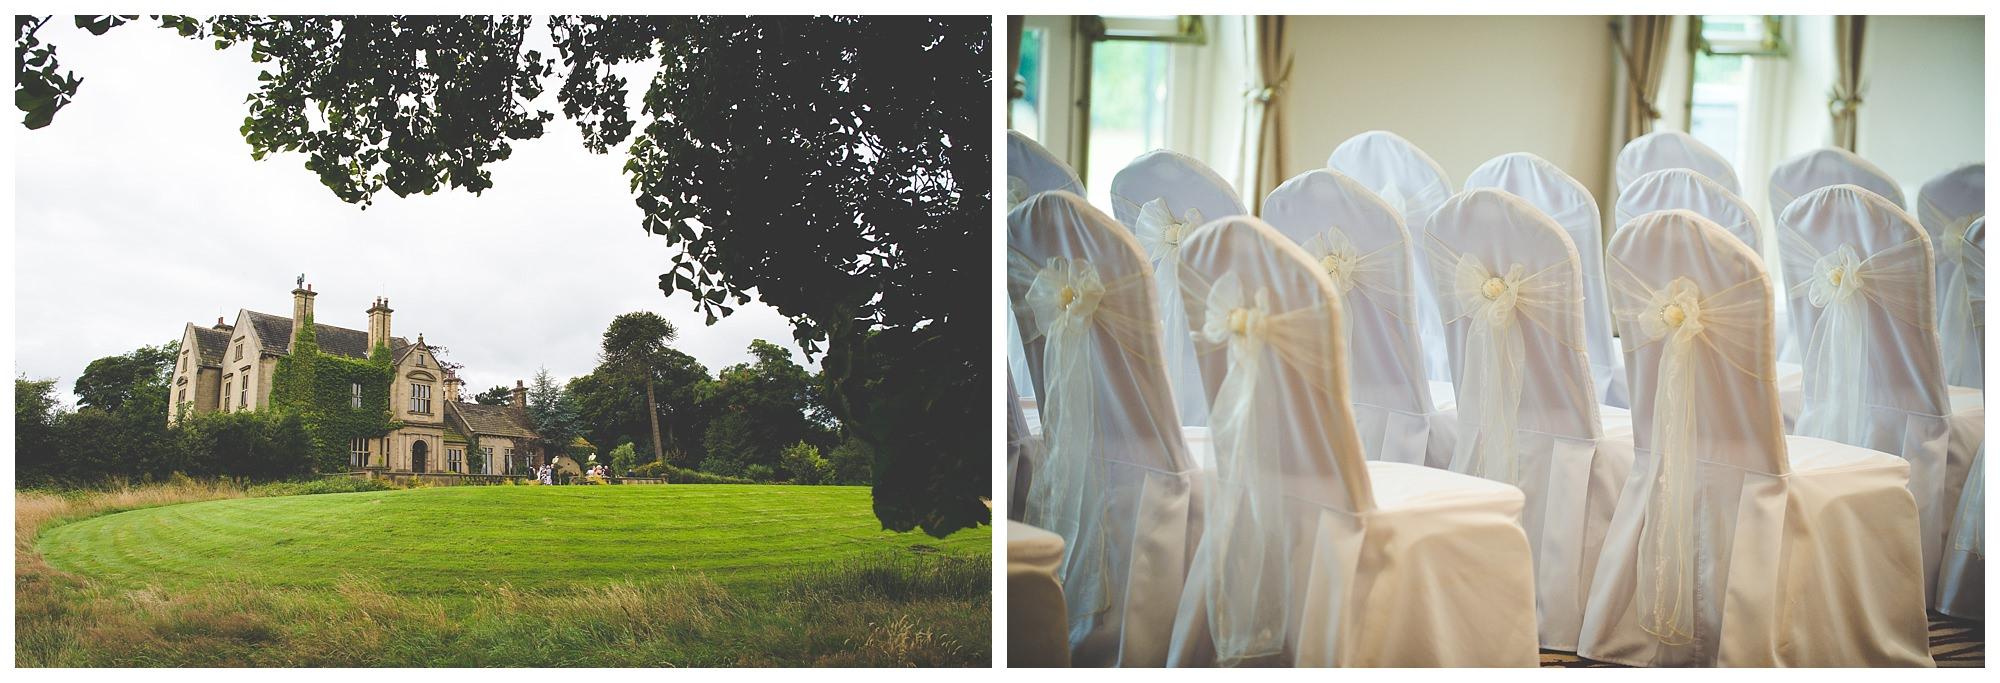 Bagden-Hall-Wedding-Photography_0018